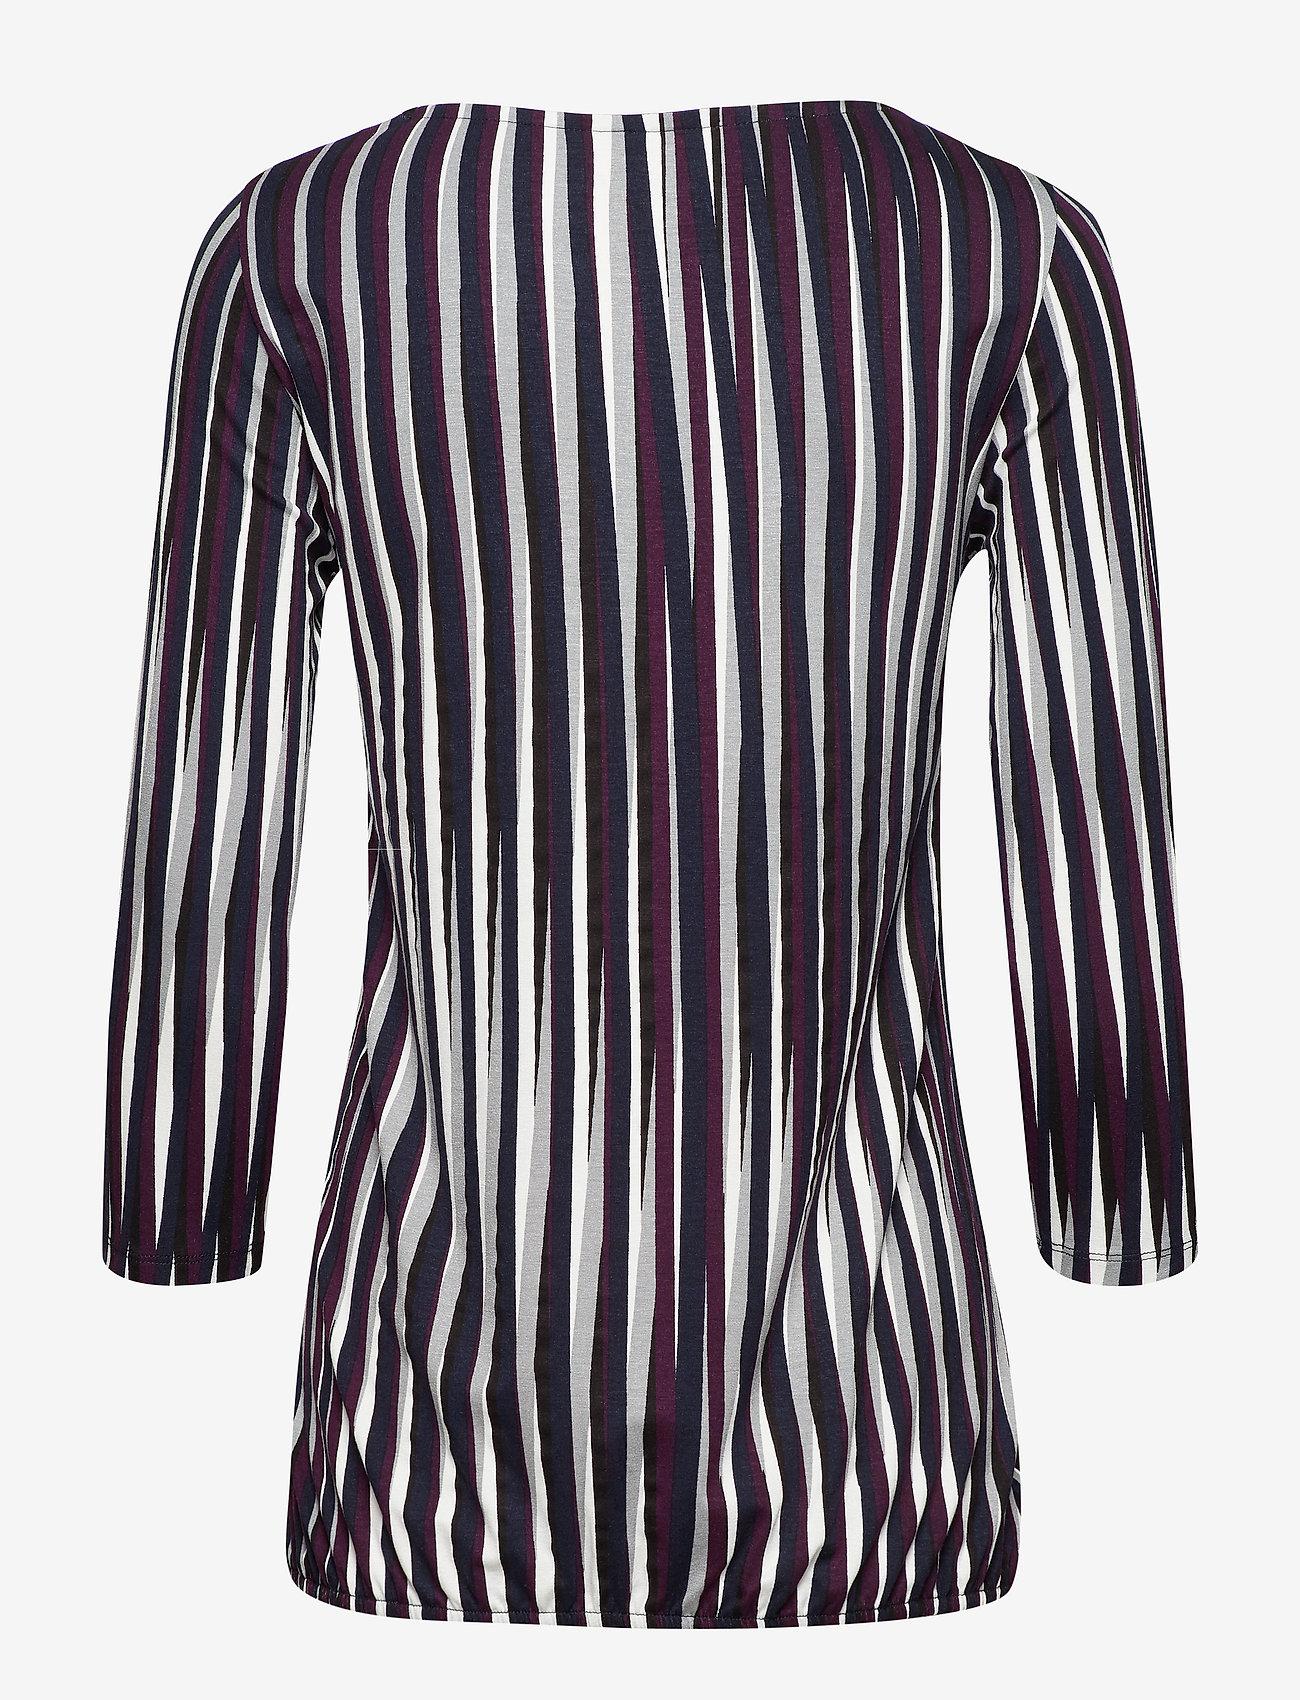 Gerry Weber Edition T-shirt 3/4-sleeve R - T-shirts & Tops